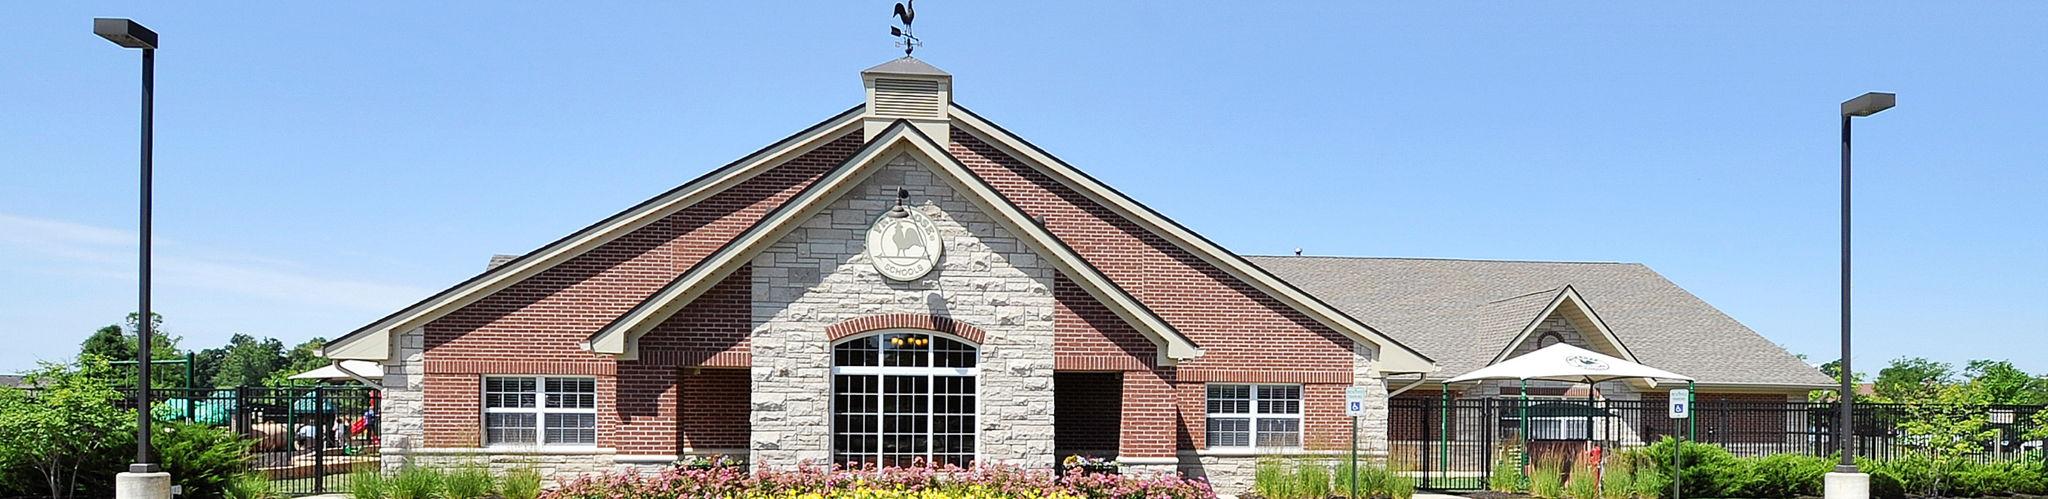 Exterior of a Primrose School of Carmel